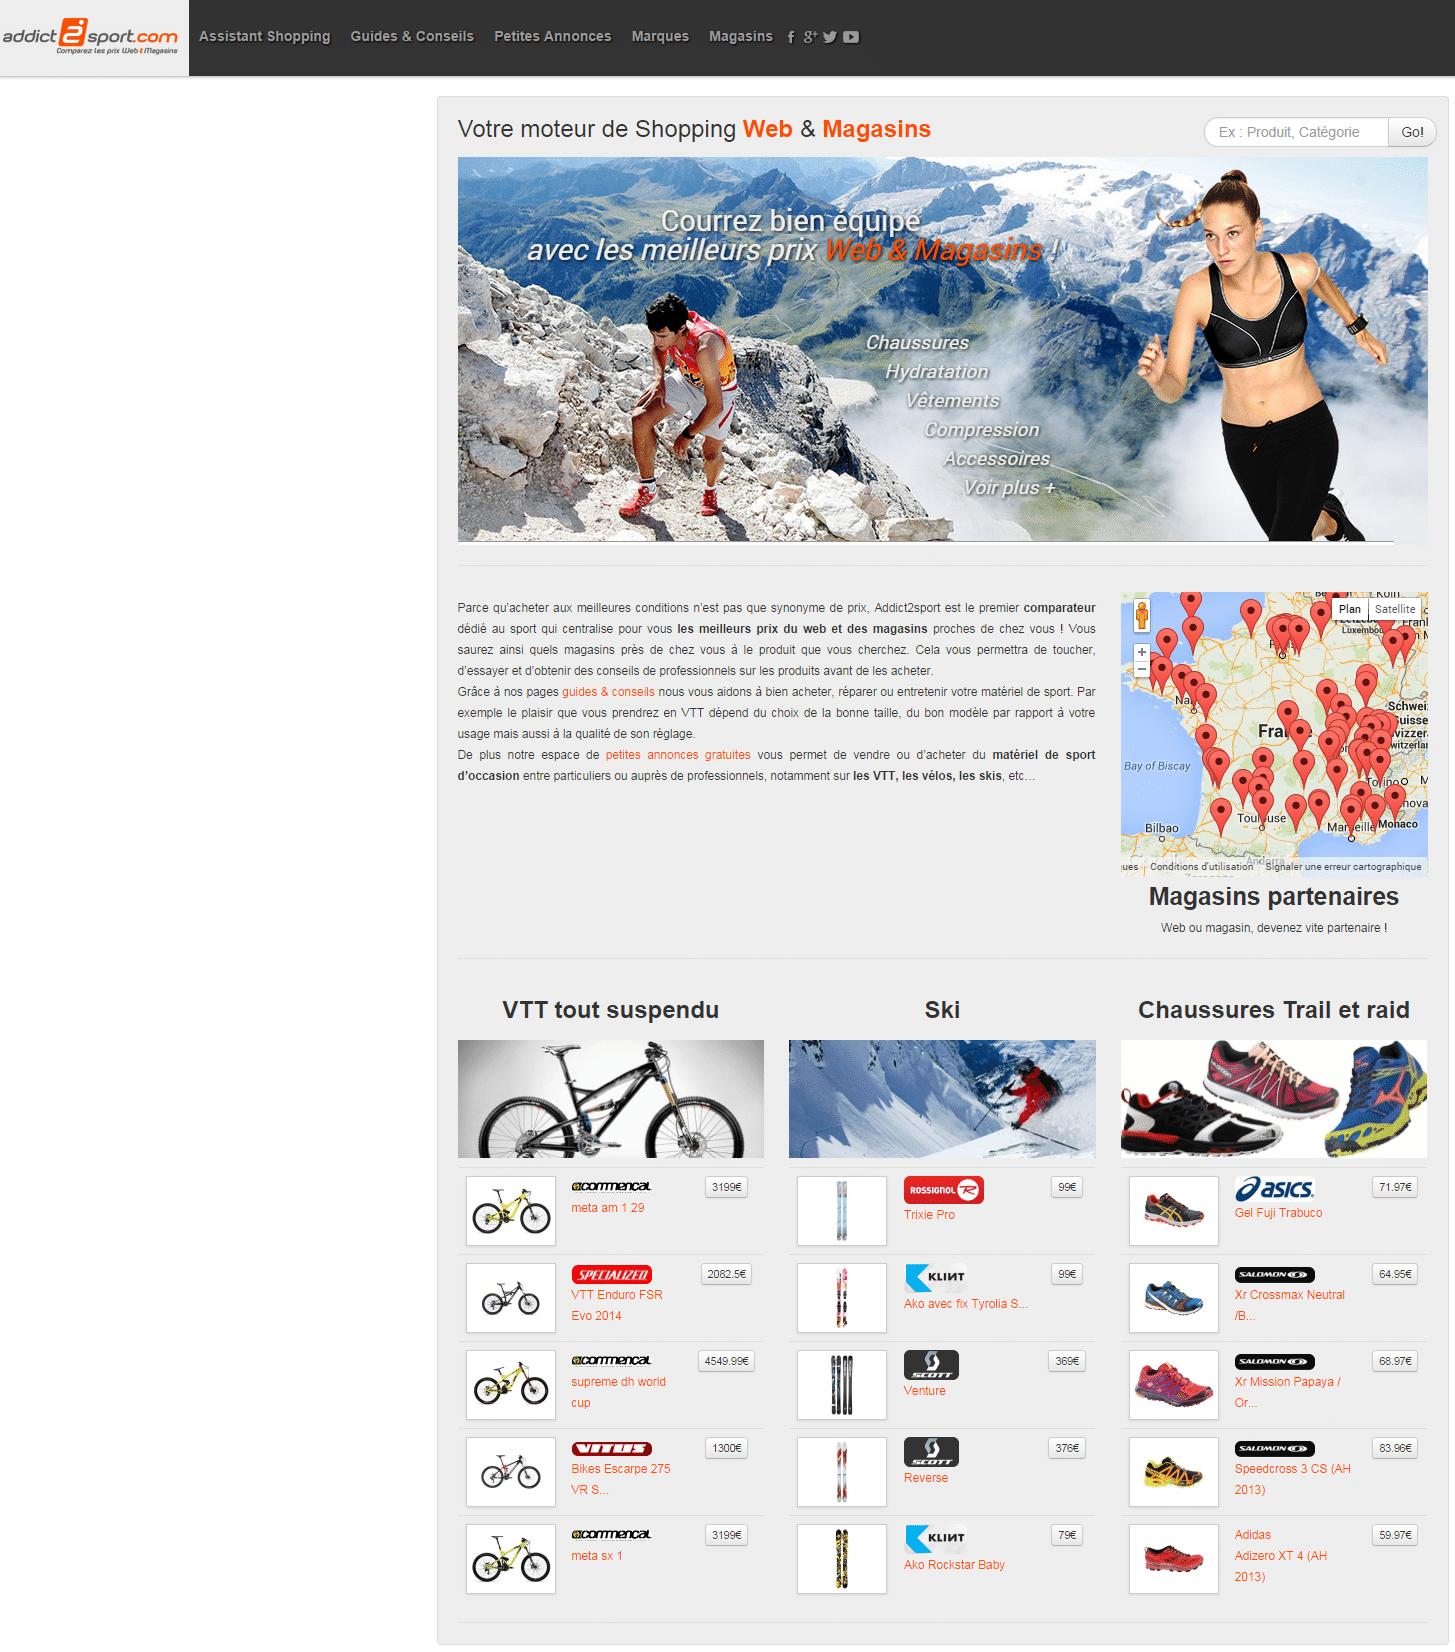 vendre sur addict2sport.com